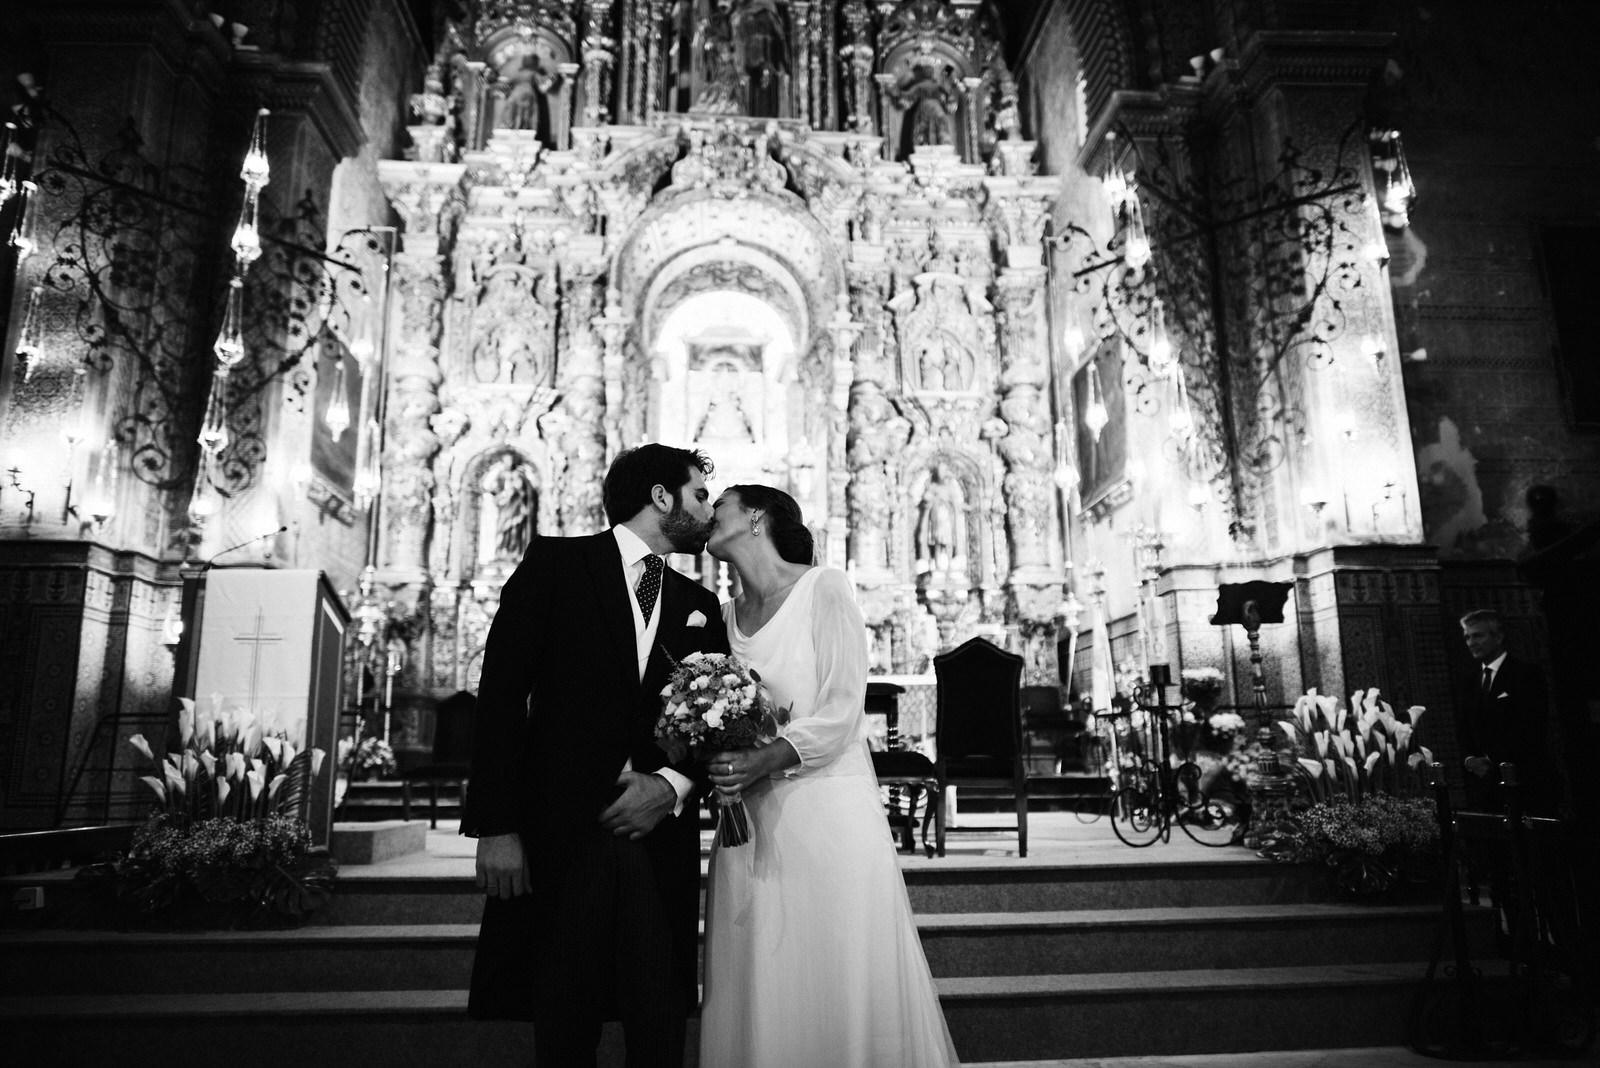 fotografo de bodas sevilla - fotografo boda - fotografía sevilla - Andrés AmarilloAAA_3176-2- fine.JPG